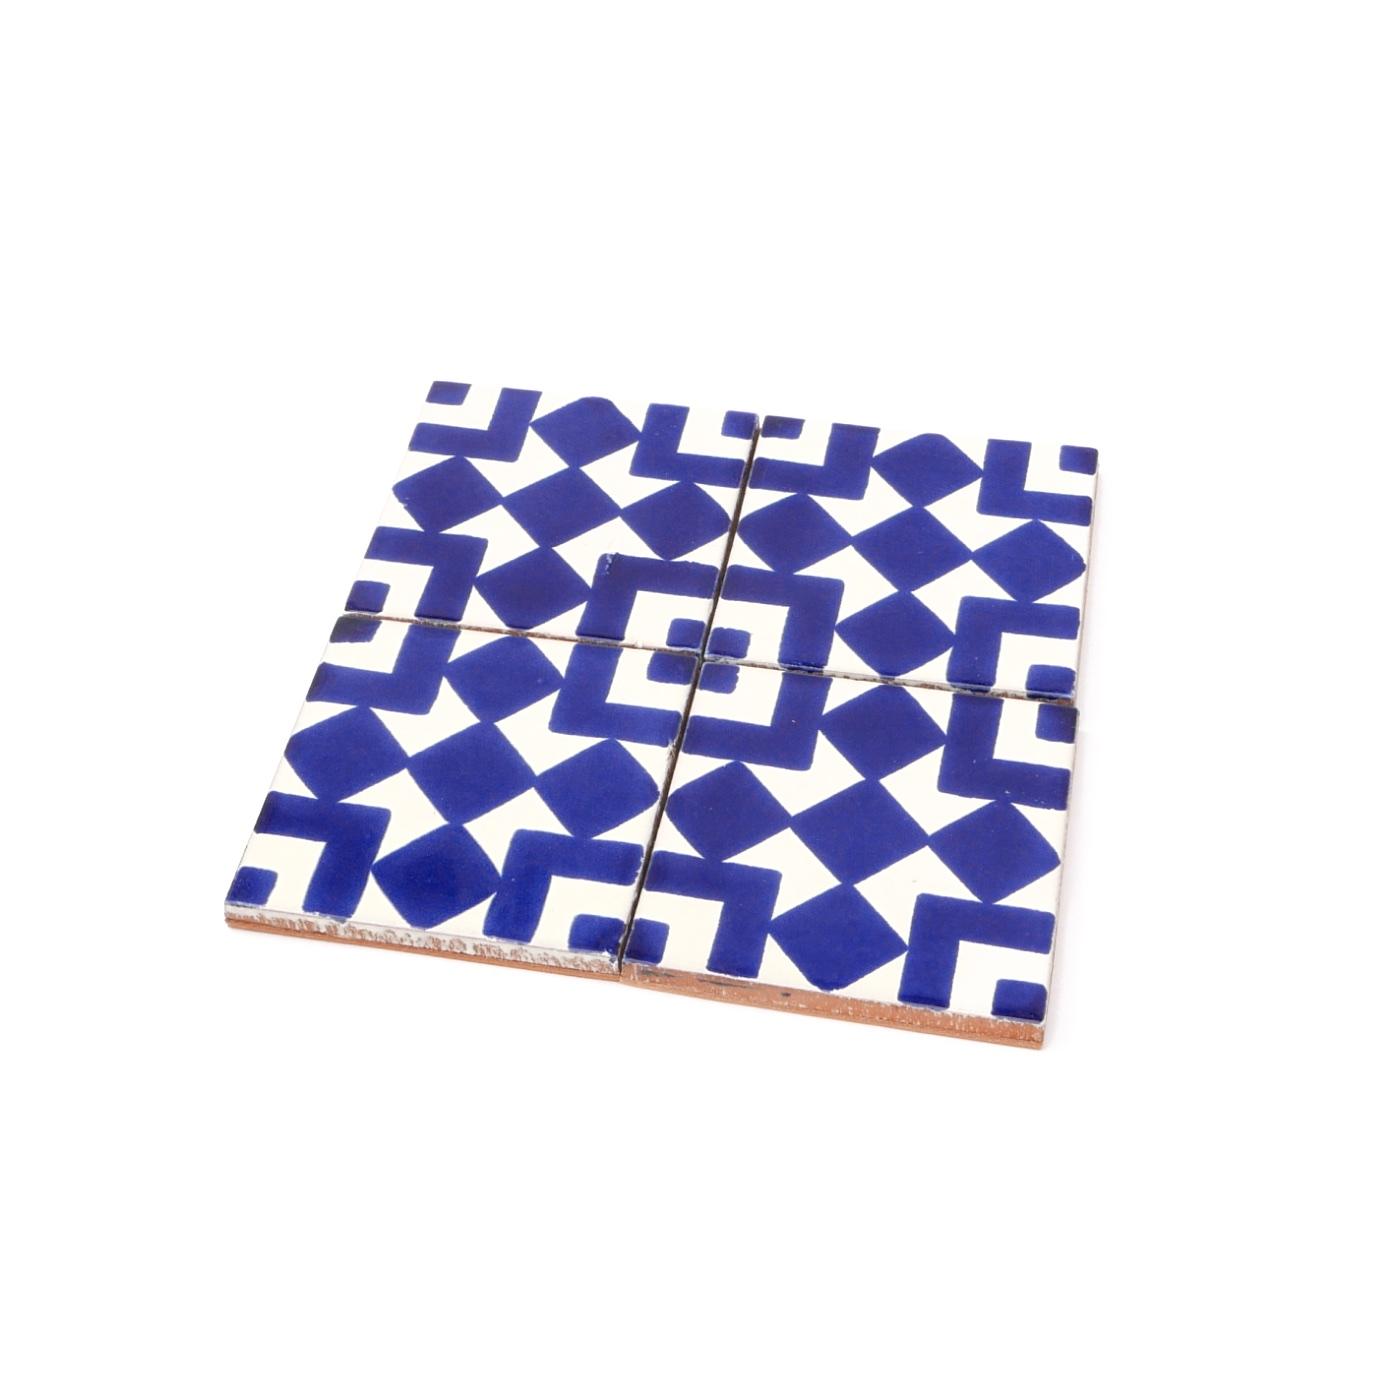 talavera tile coaster set made solid